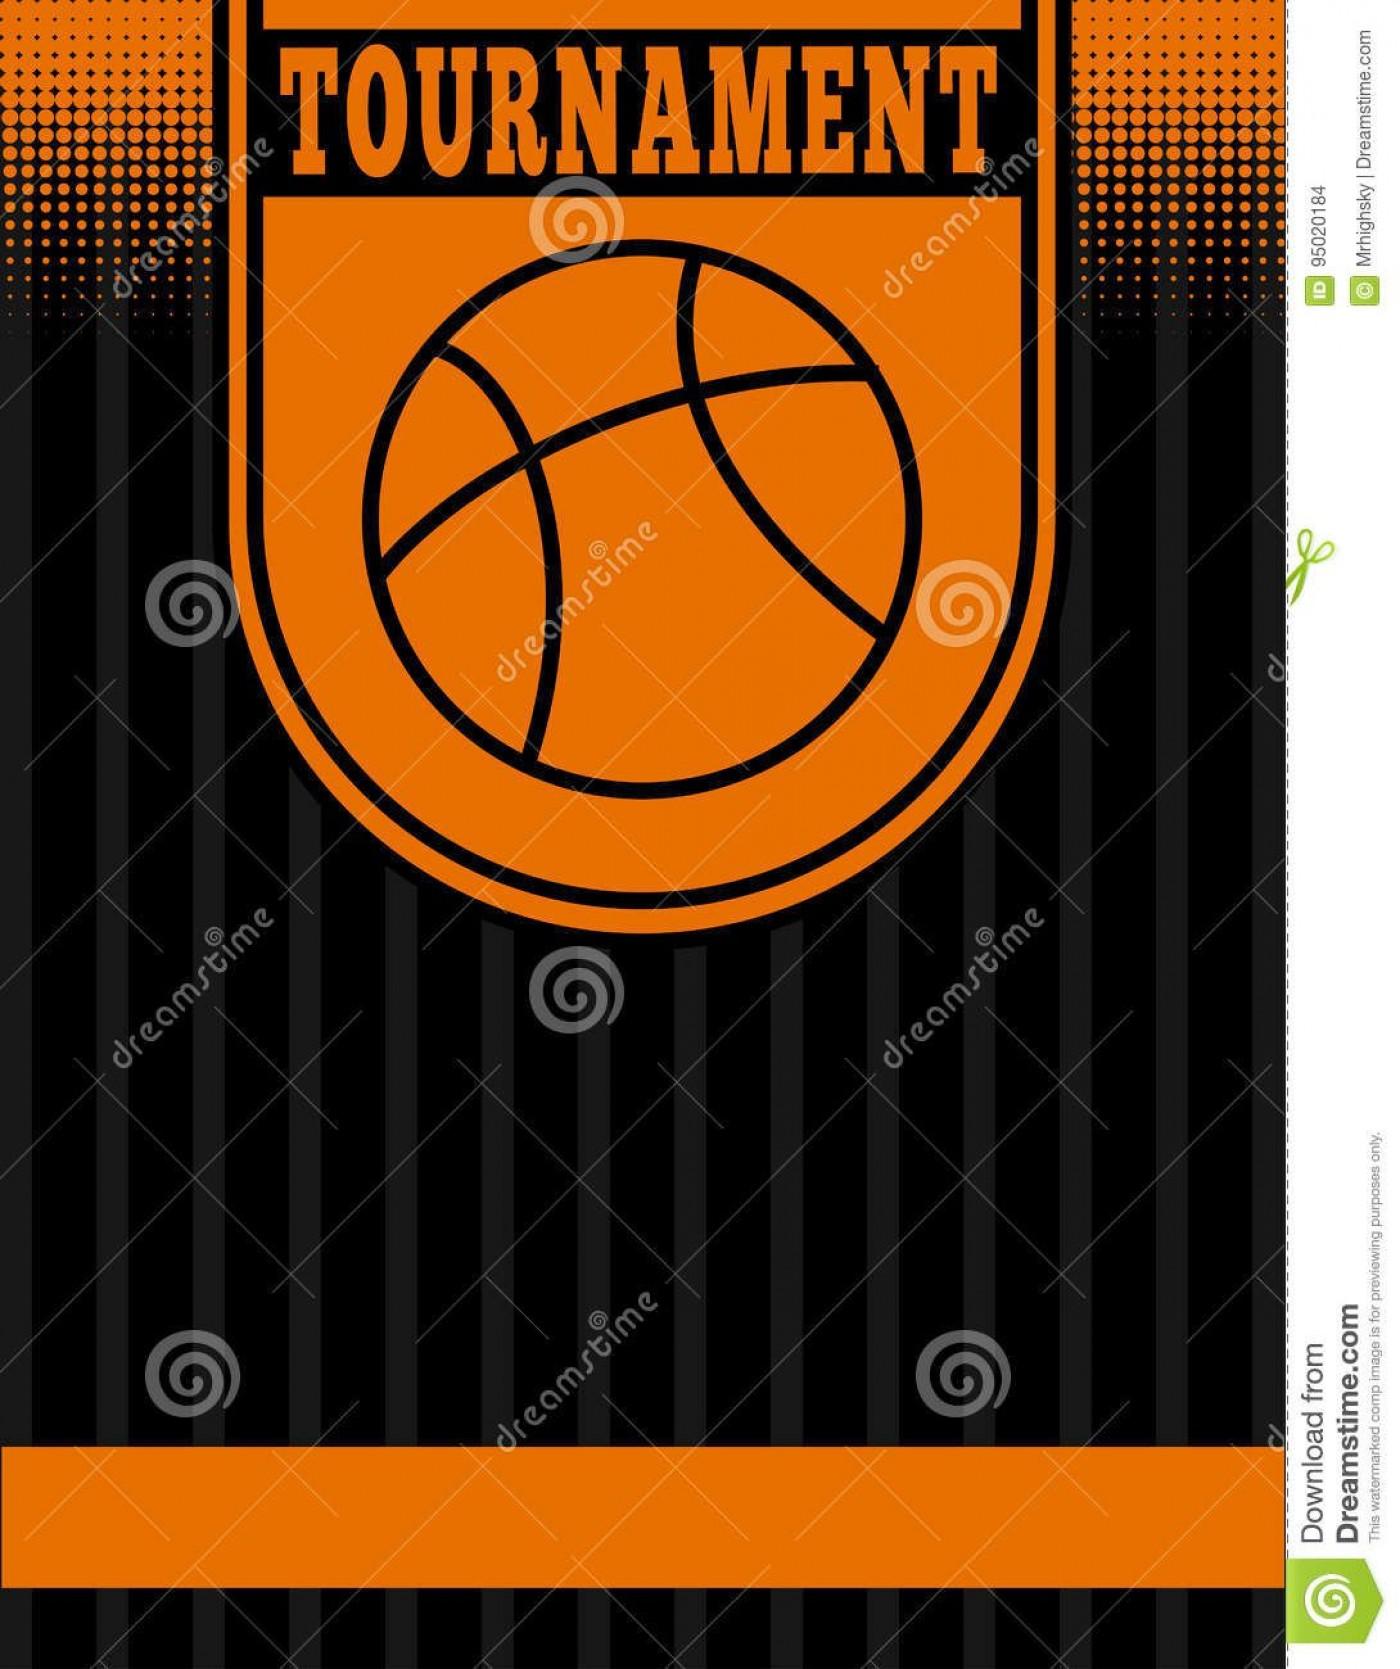 005 Singular Basketball Tournament Flyer Template Idea  3 On Free1400